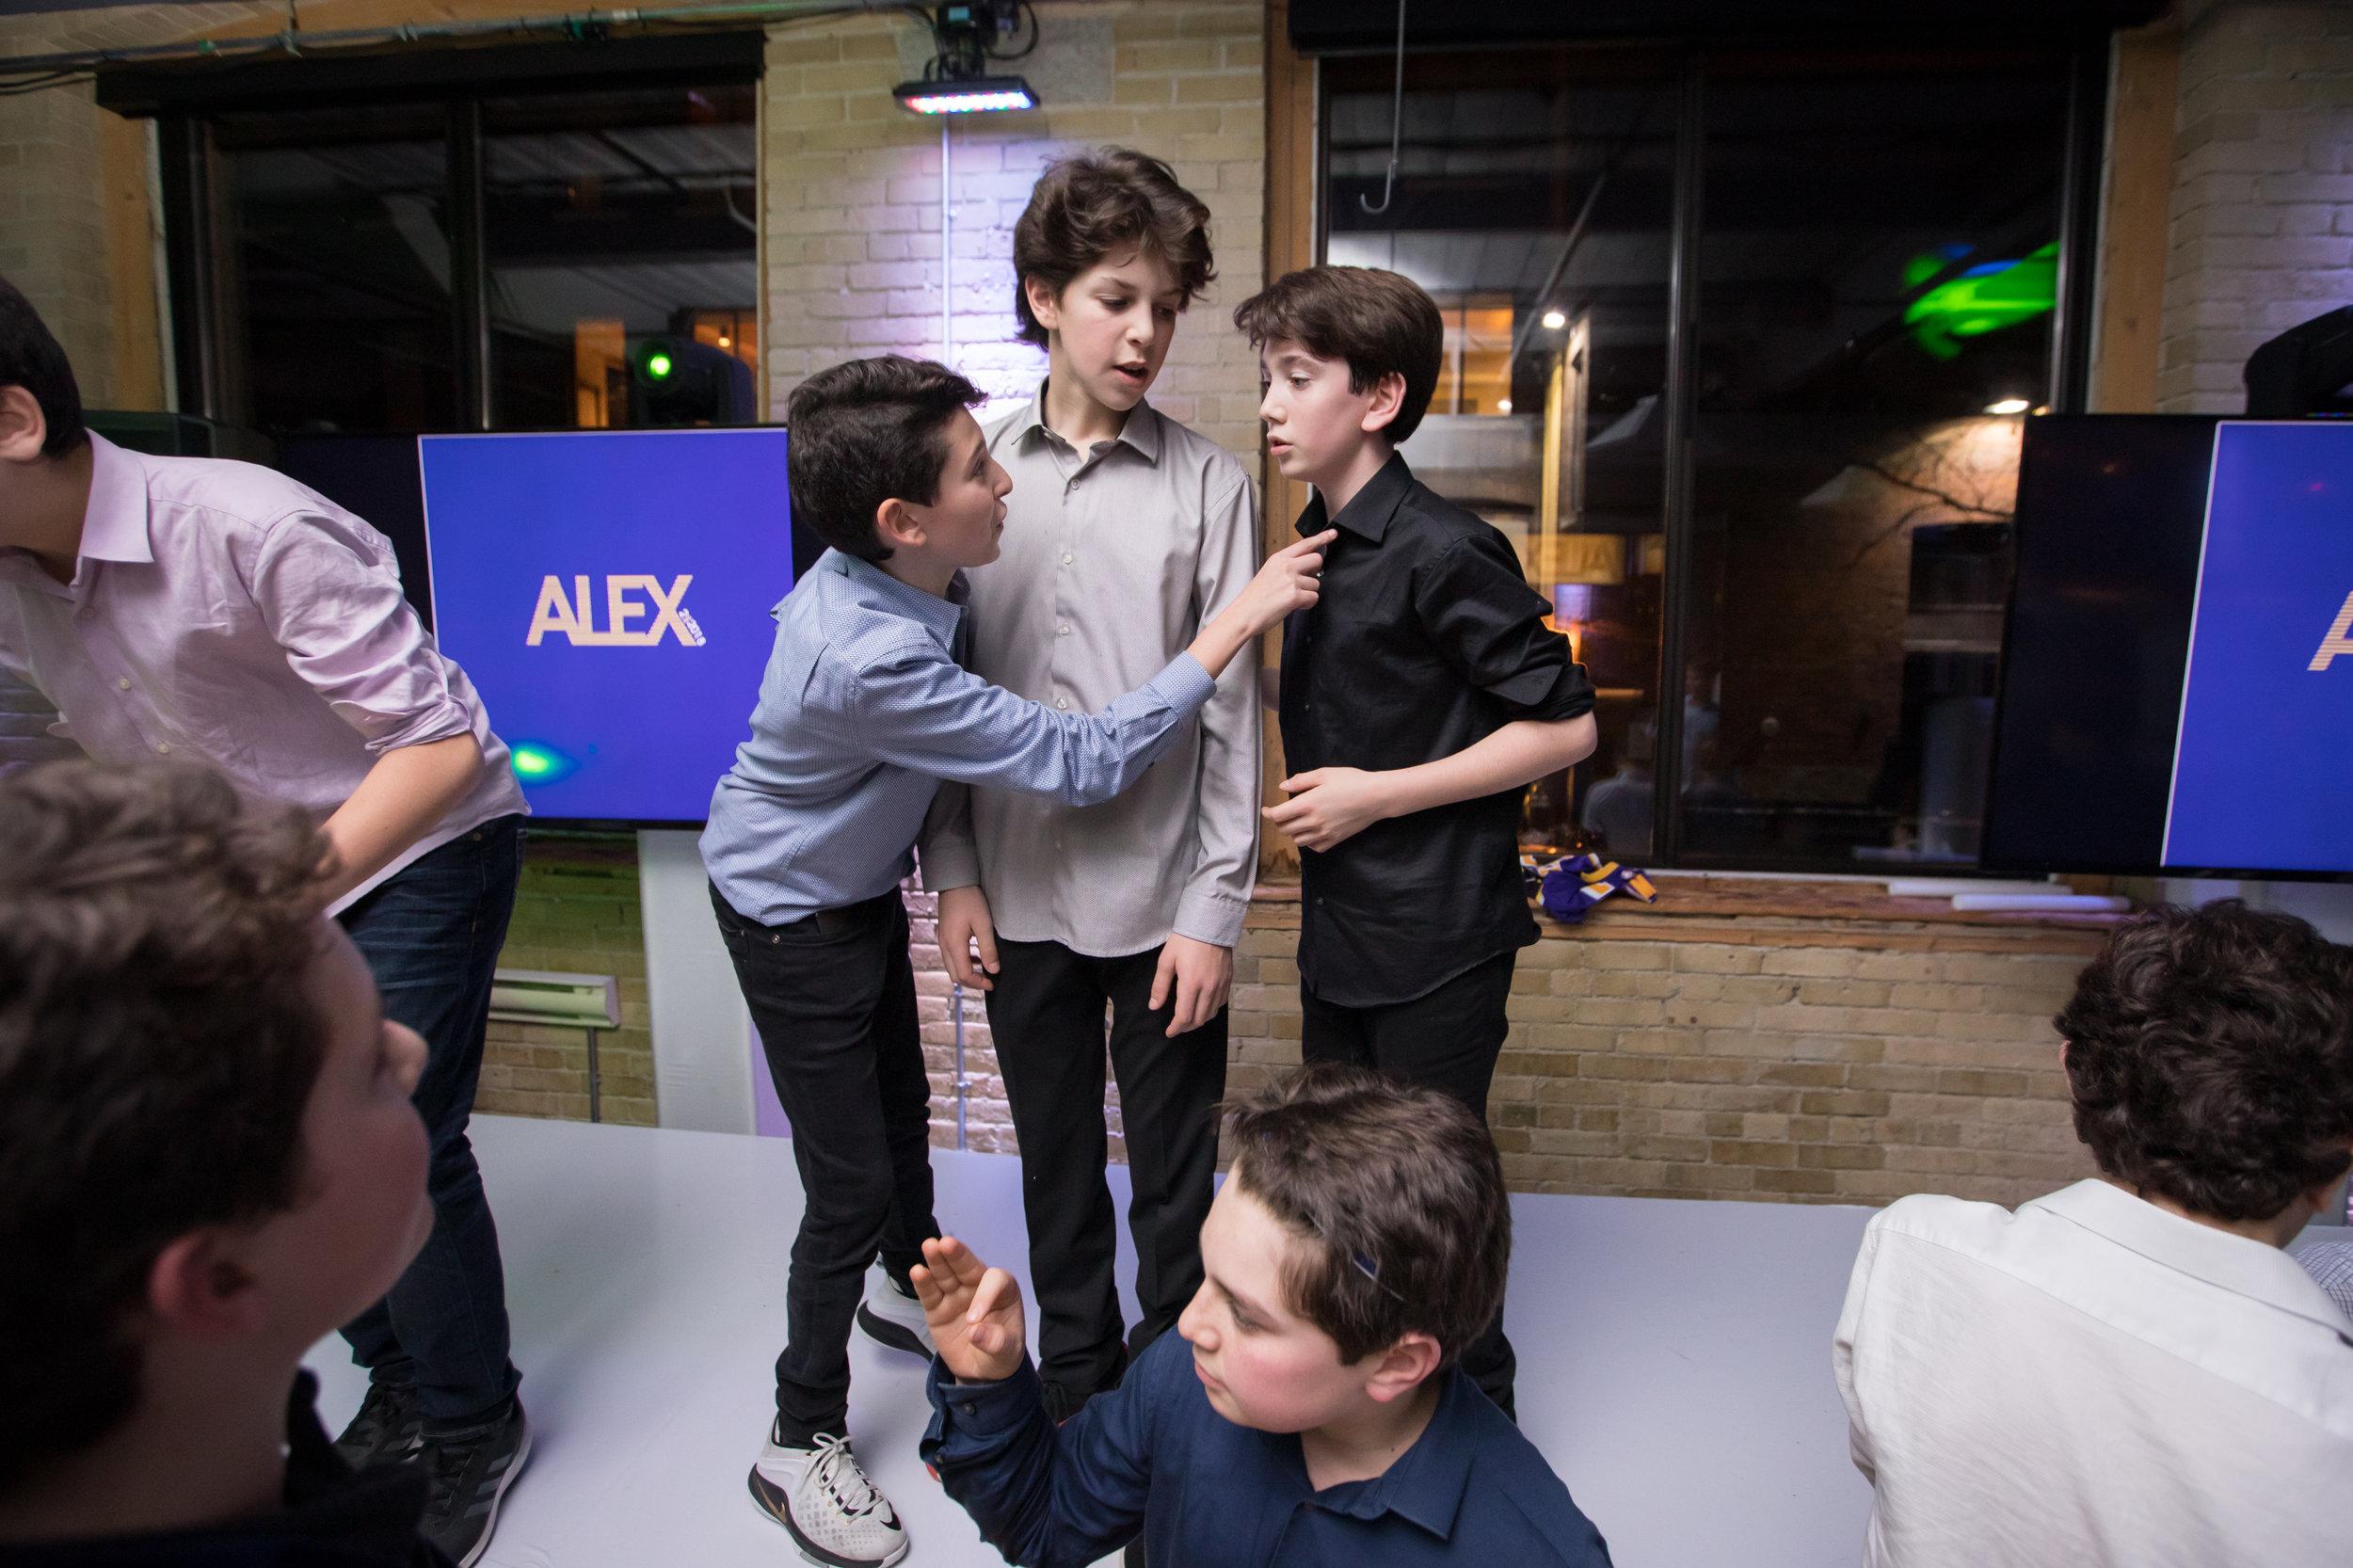 Alex-Party-0742.jpg